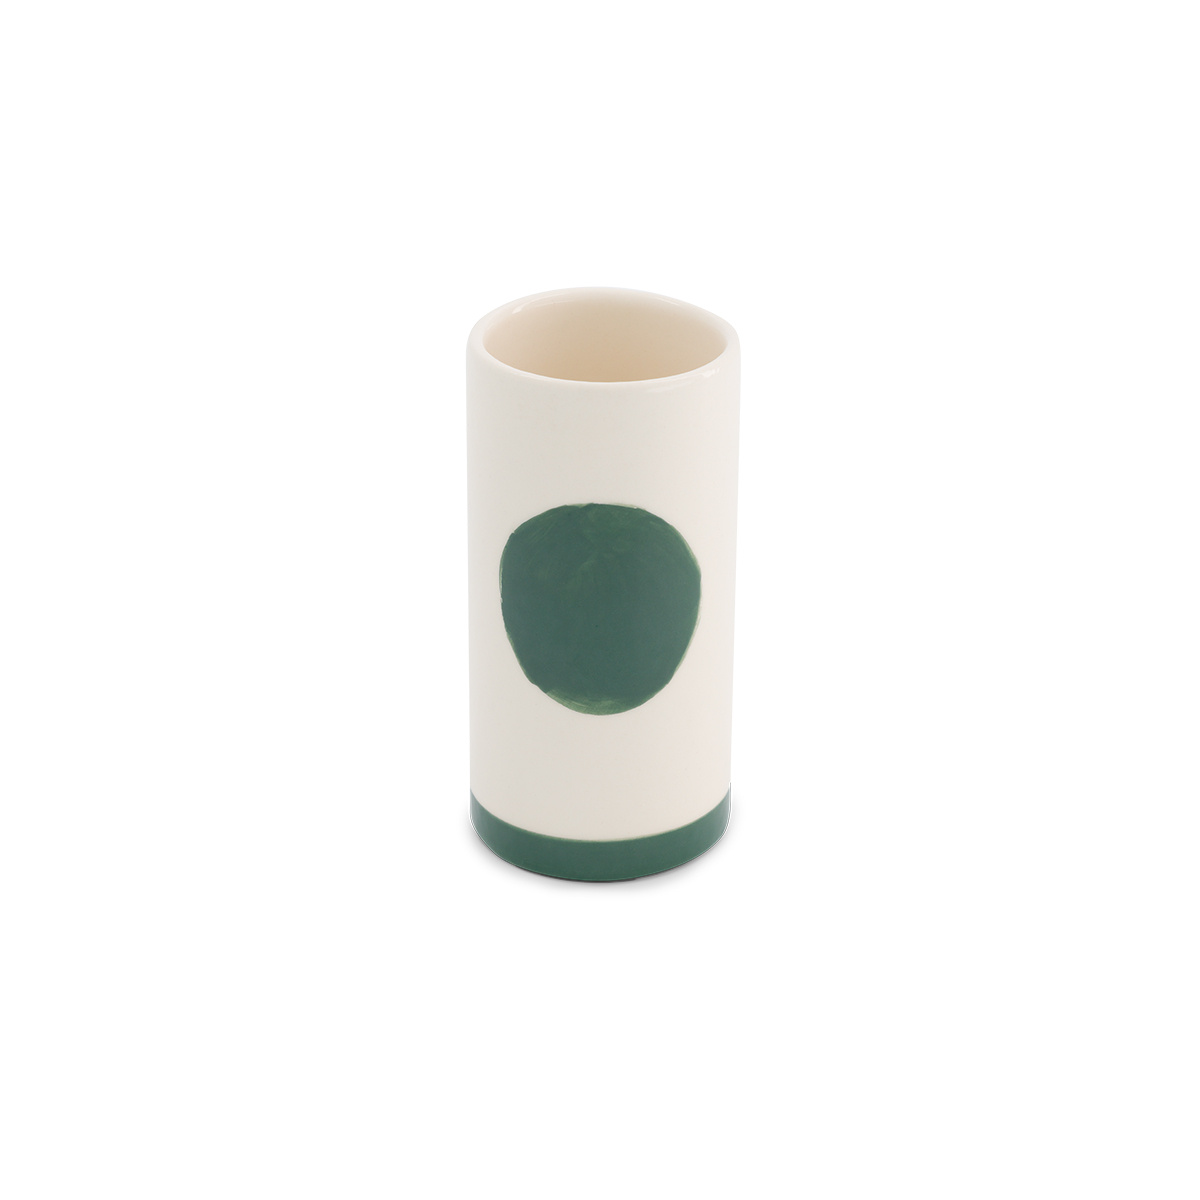 Pot Domino petit modèle motif vert